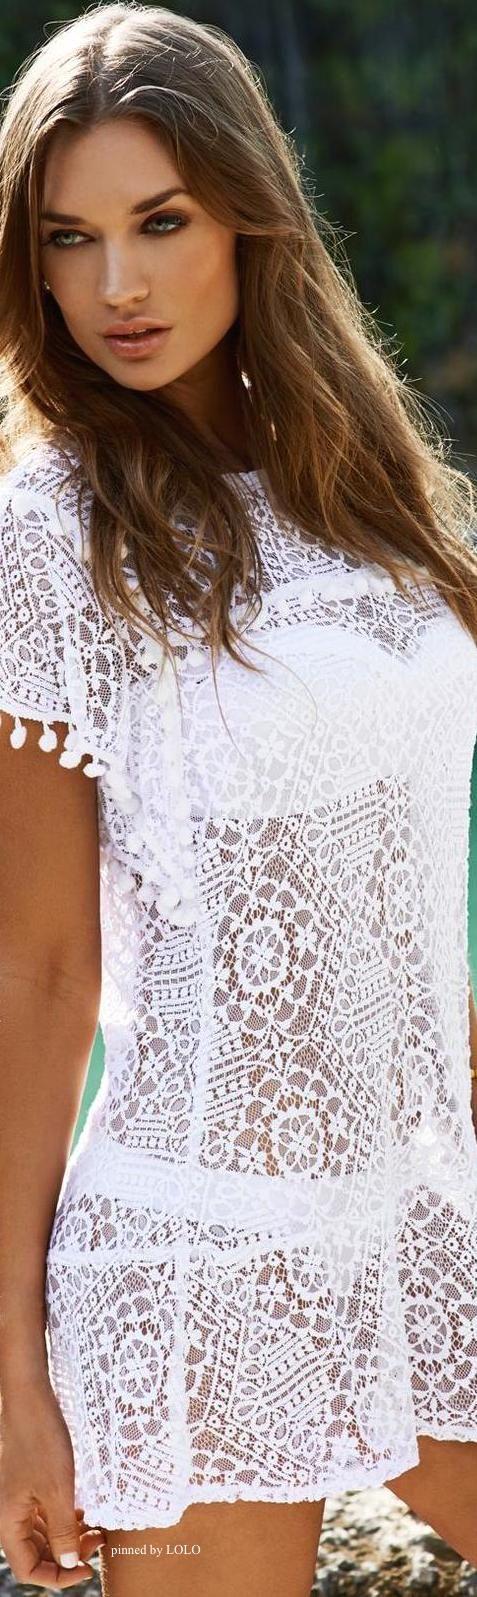 Travel Ready Resort Wear| Serafini Amelia| Lace swim cover